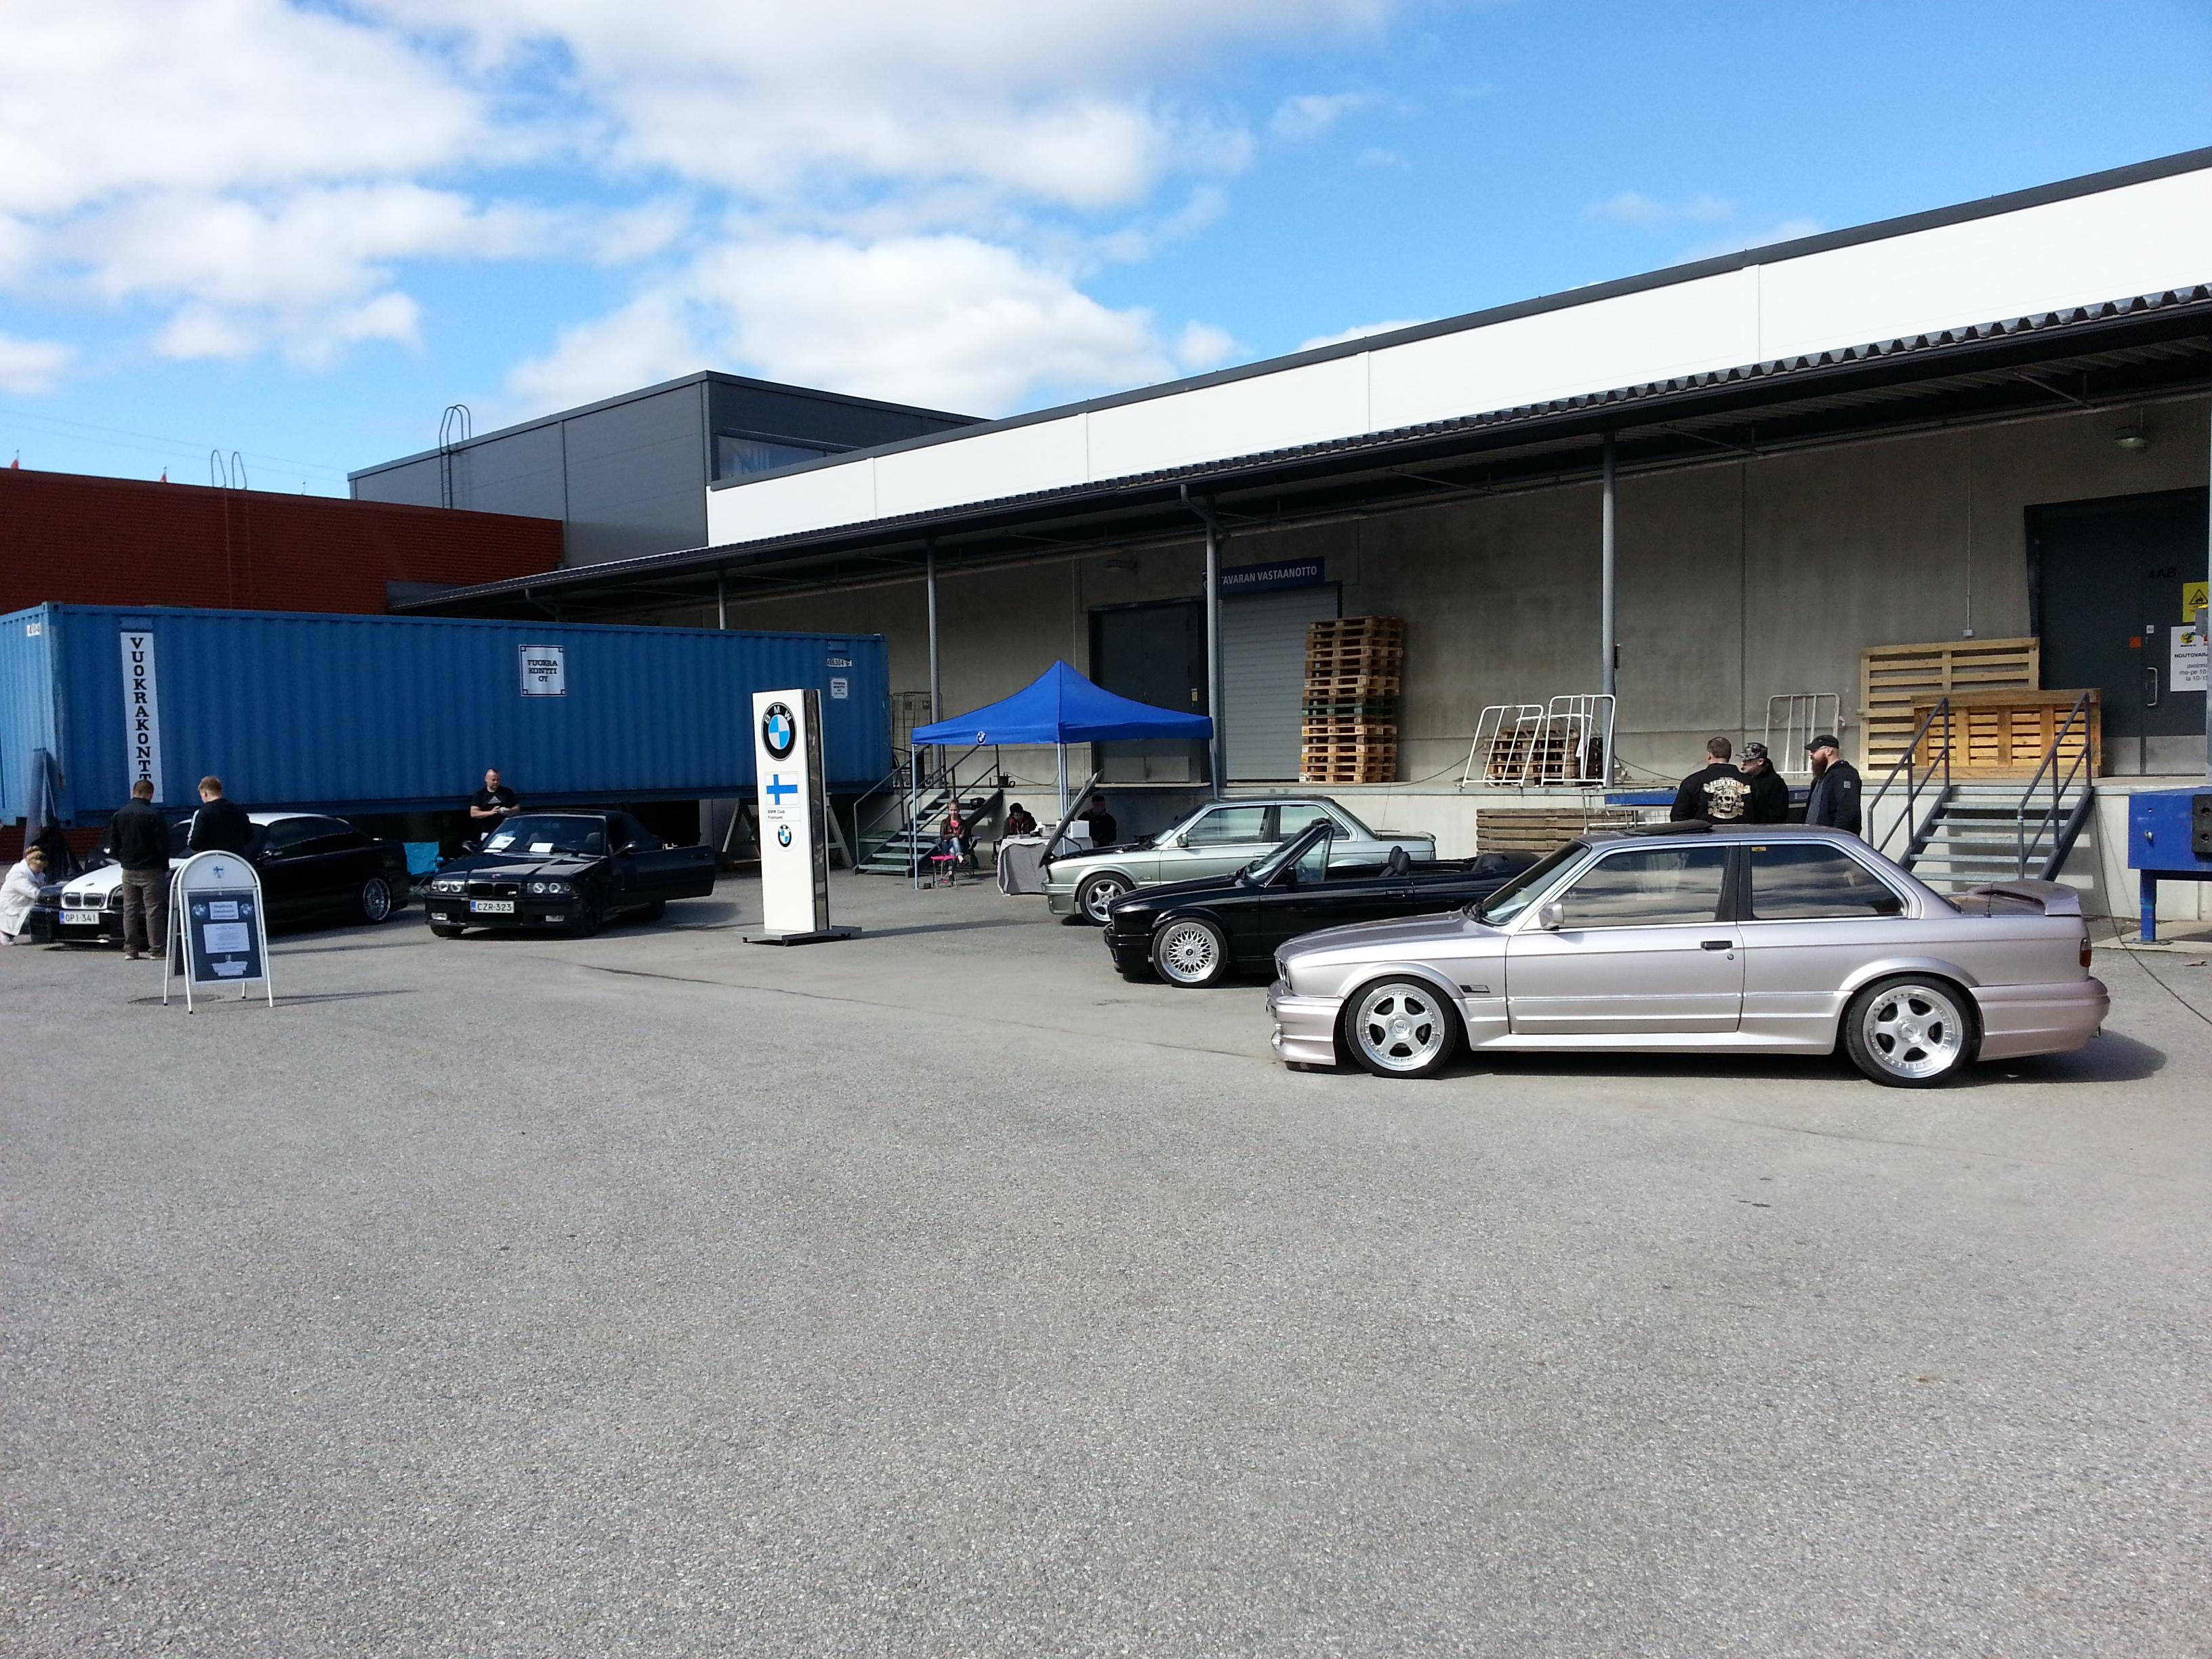 BMW Club Finnland:n osasto Backwoods Cruising 2015 tapahtumassa.